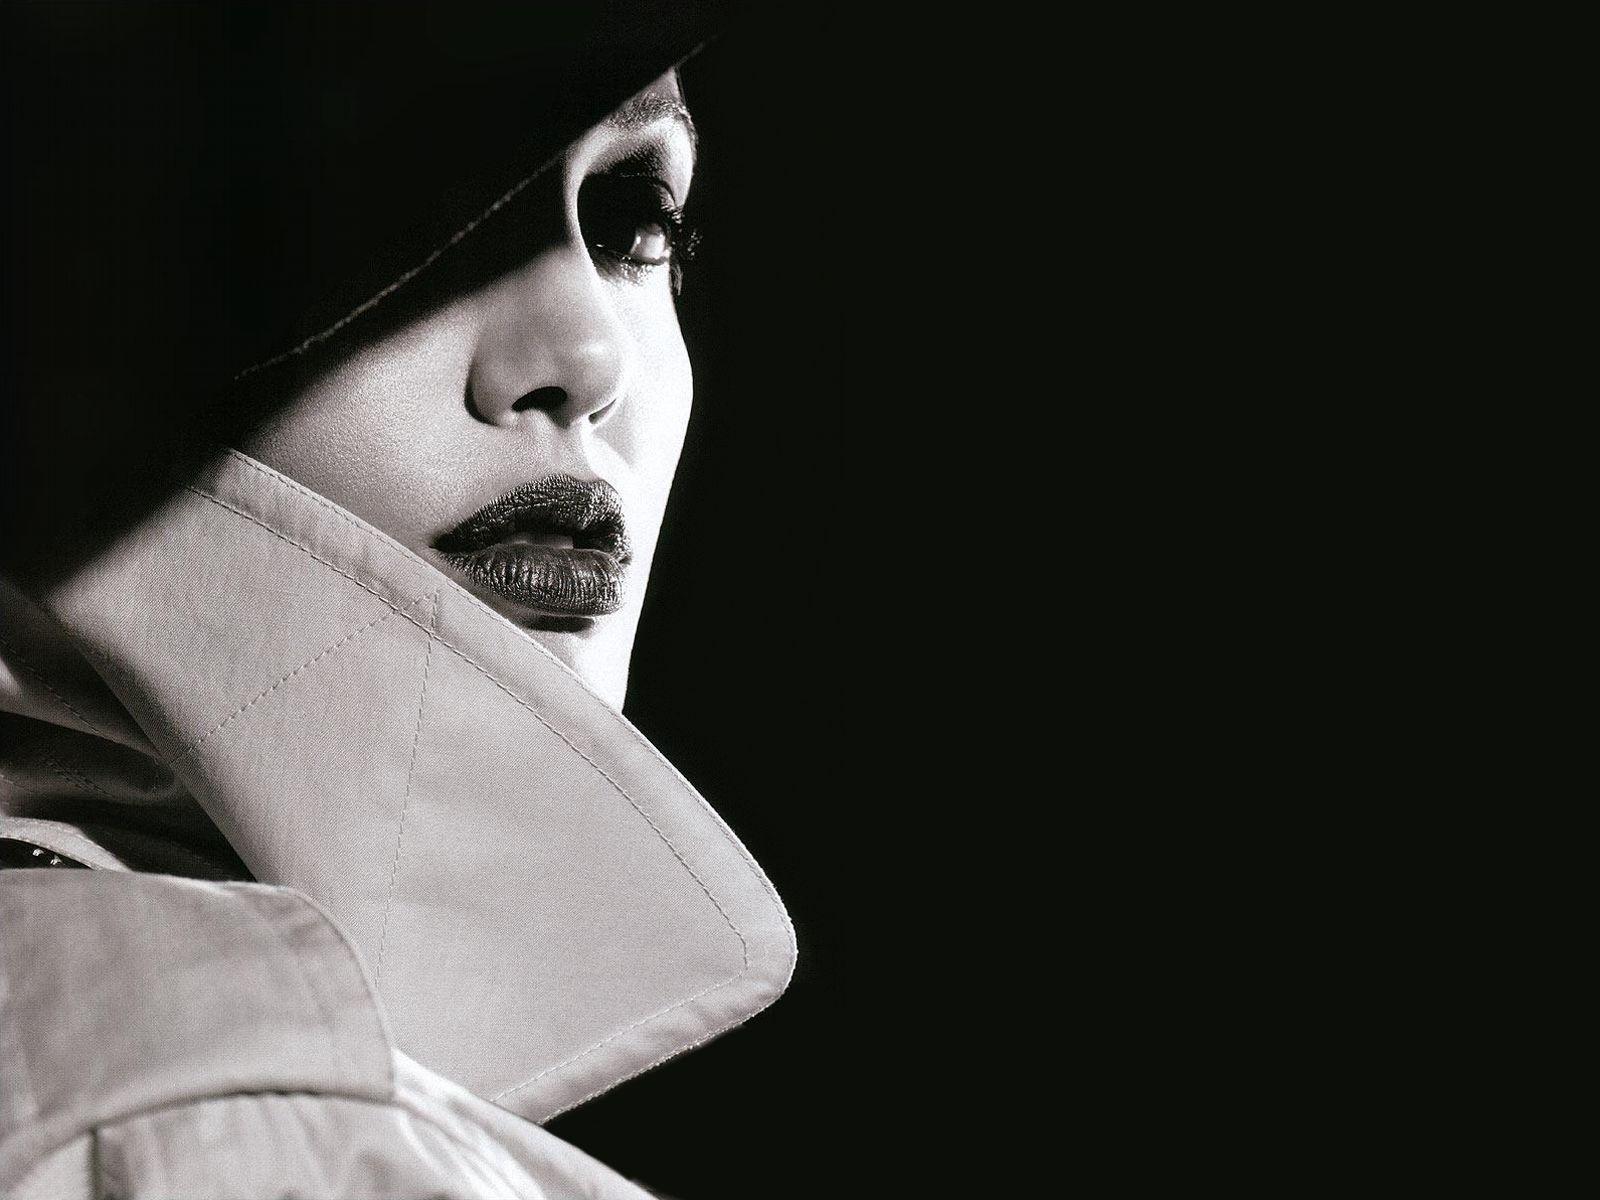 Wallpapers of people   Angelina Jolie Film Noir 1600x1200